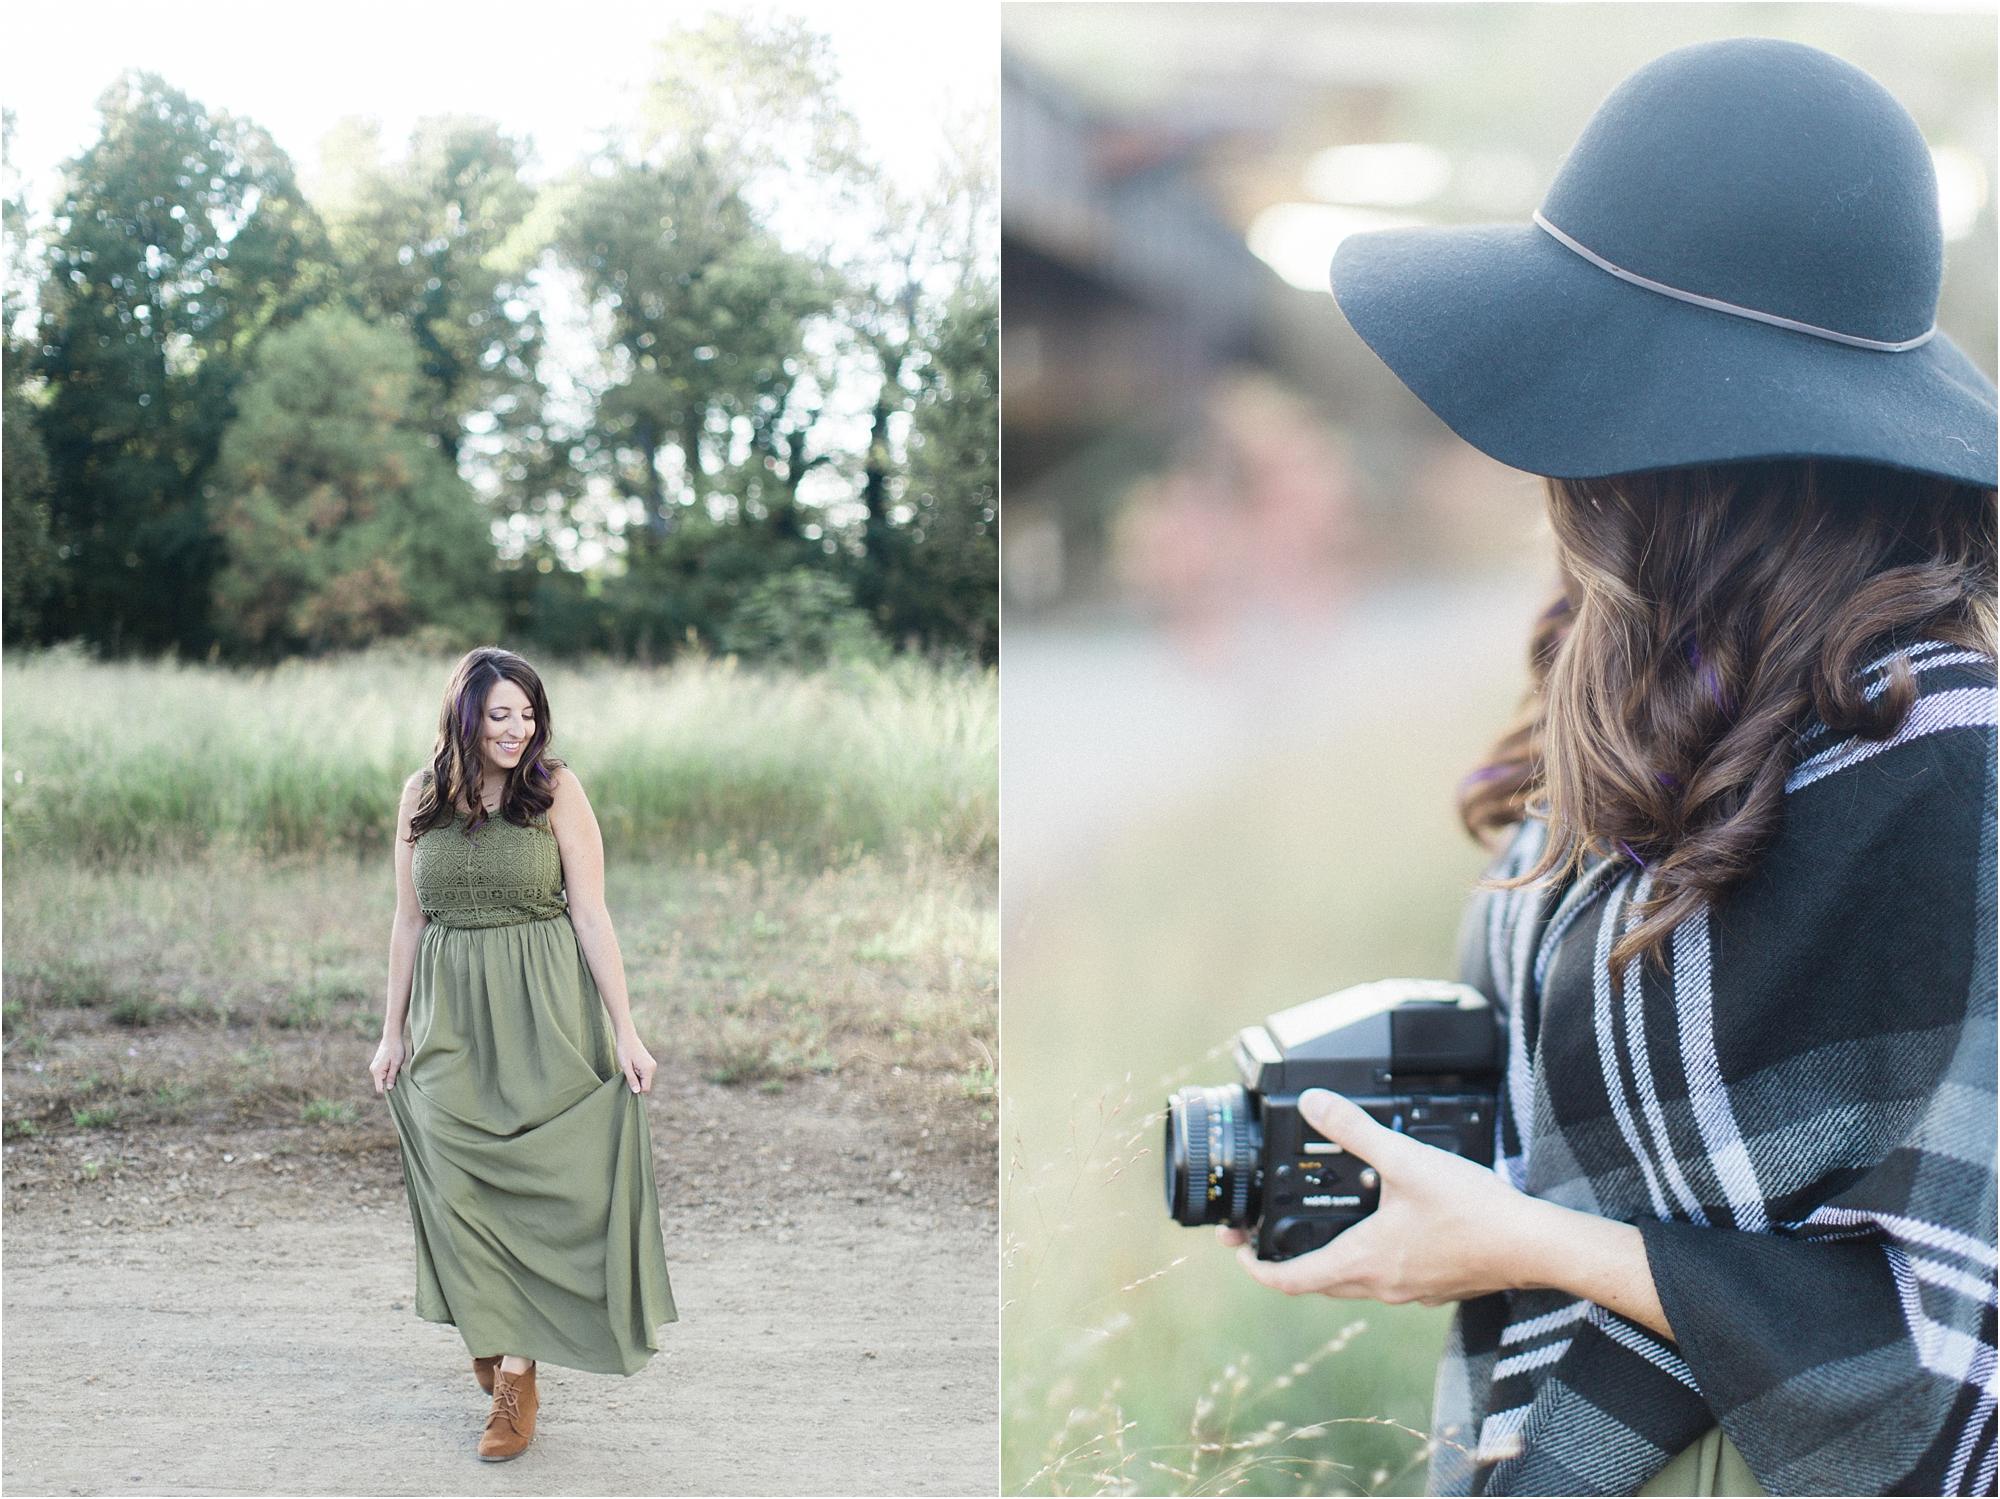 stephanie-yonce-photography-headshots-belle-isle-richmond-va_0010.jpg